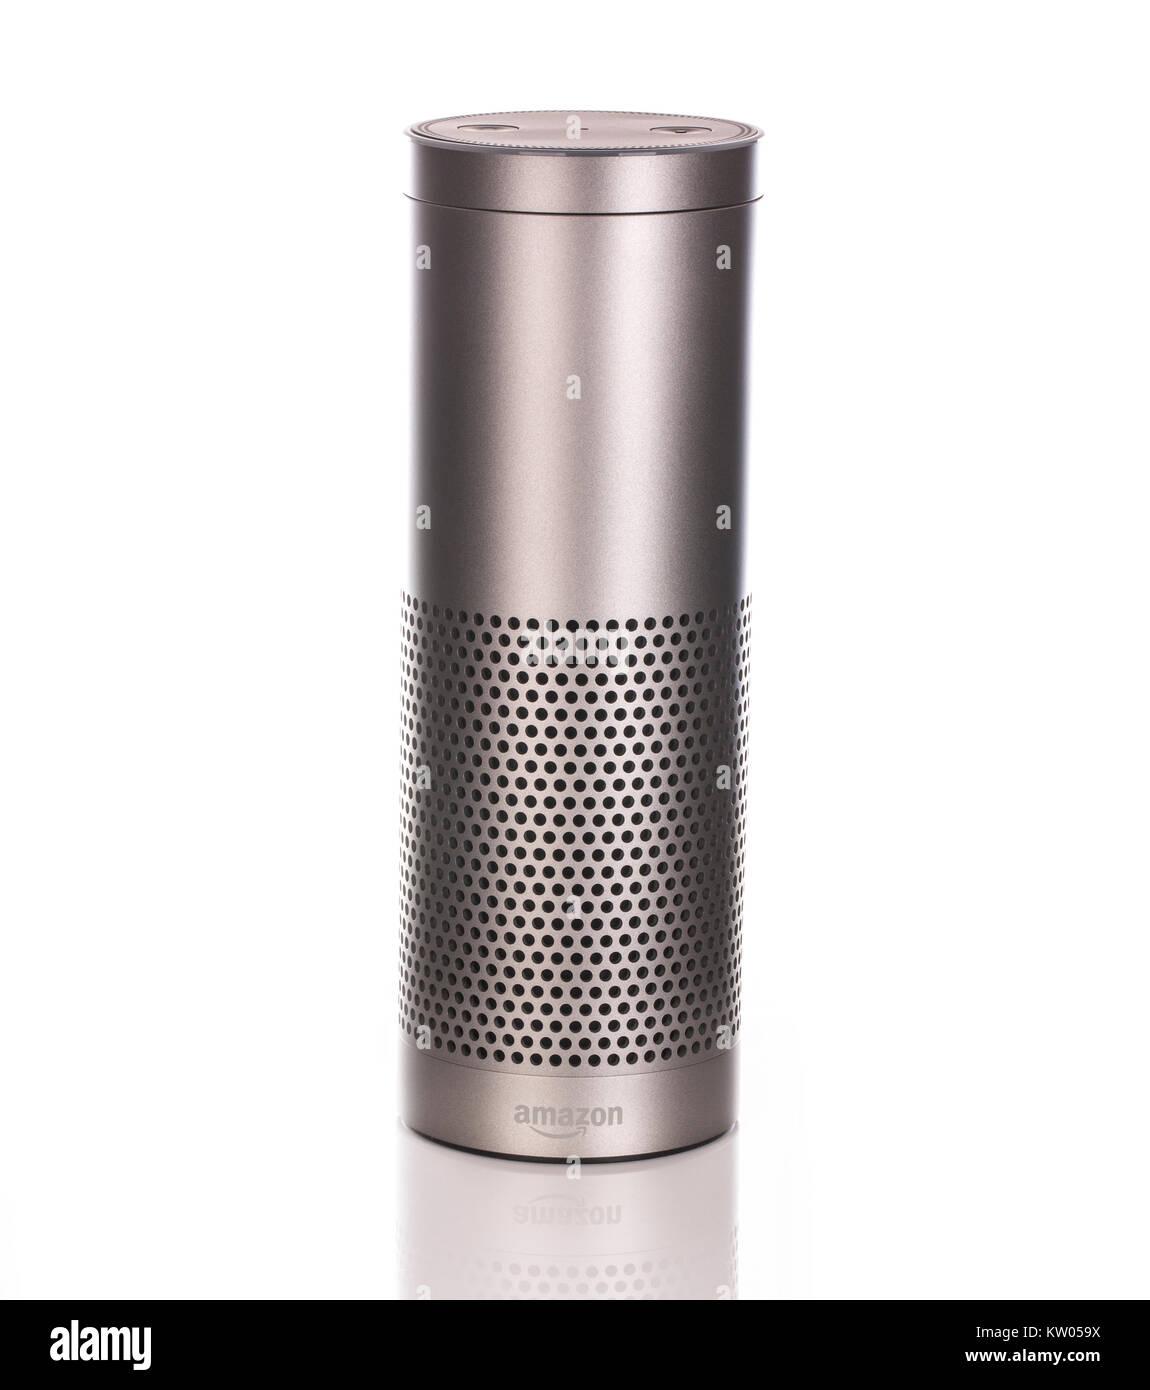 SWINDON, UK - DECEMBER 28, 2017:  Amazon Echo Plus in Silver on a white background - Stock Image